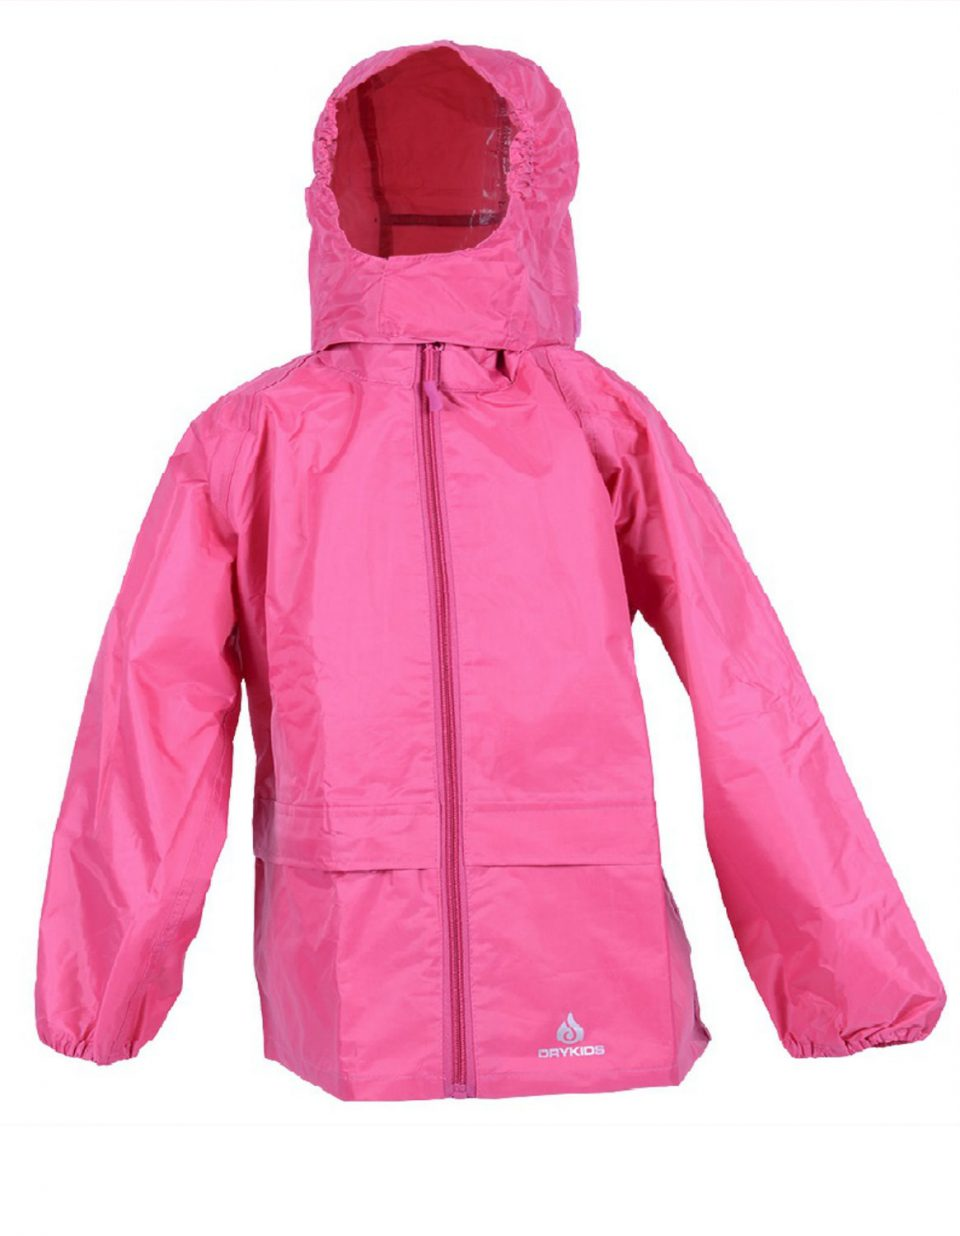 dk003-pink-fullv1